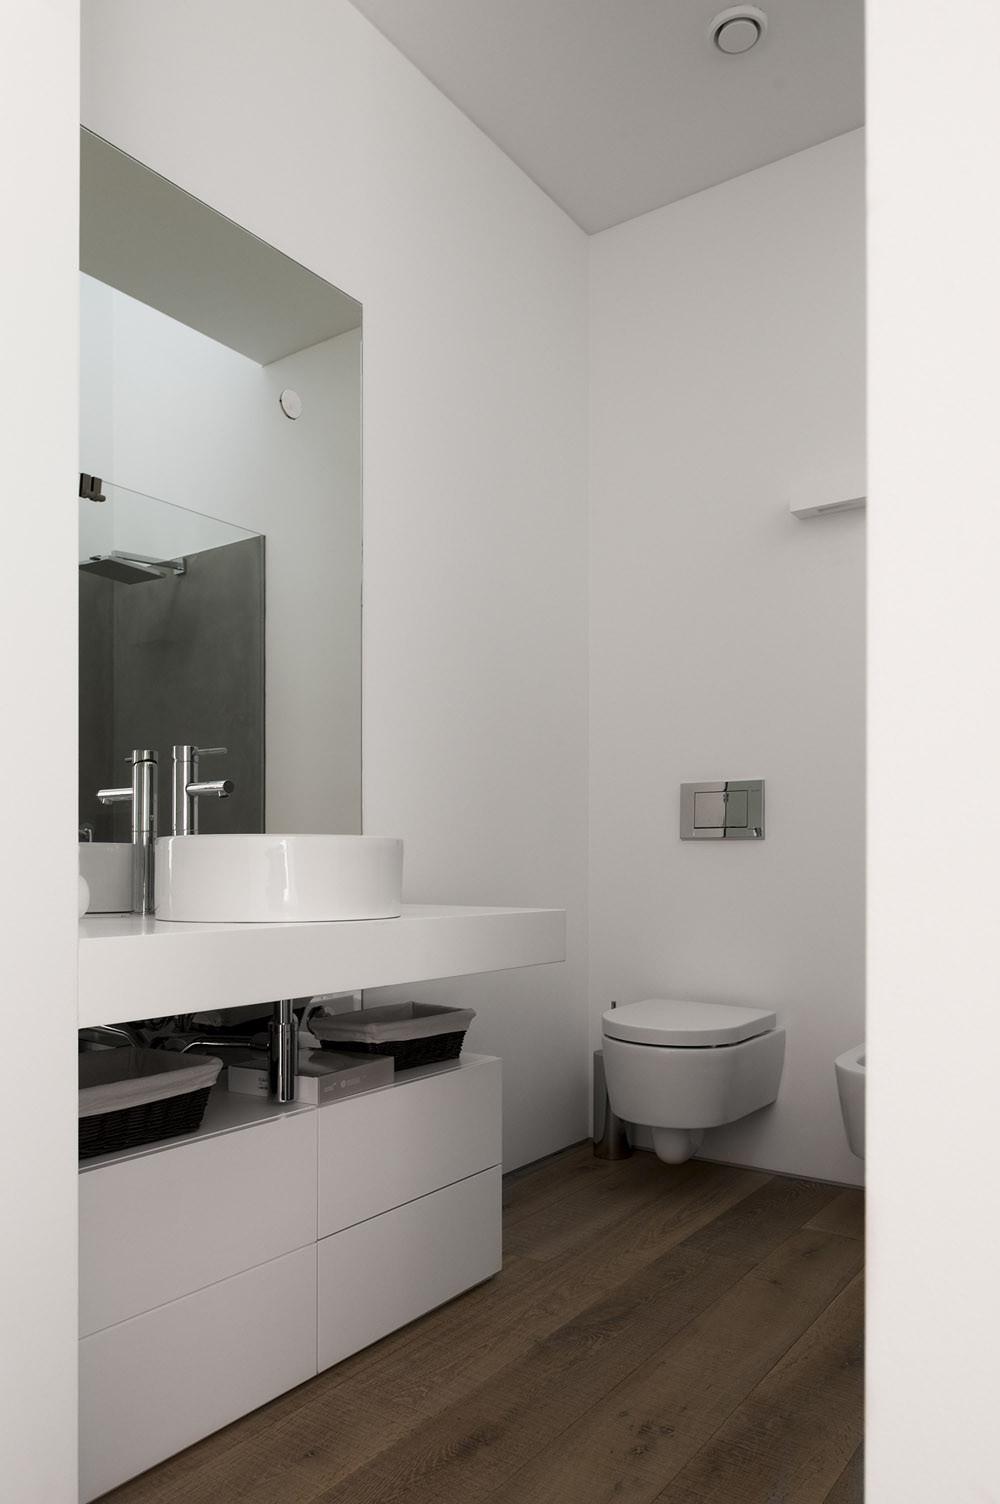 Galeria de casa comporta rrj arquitectos 10 for Arquitectos para casas